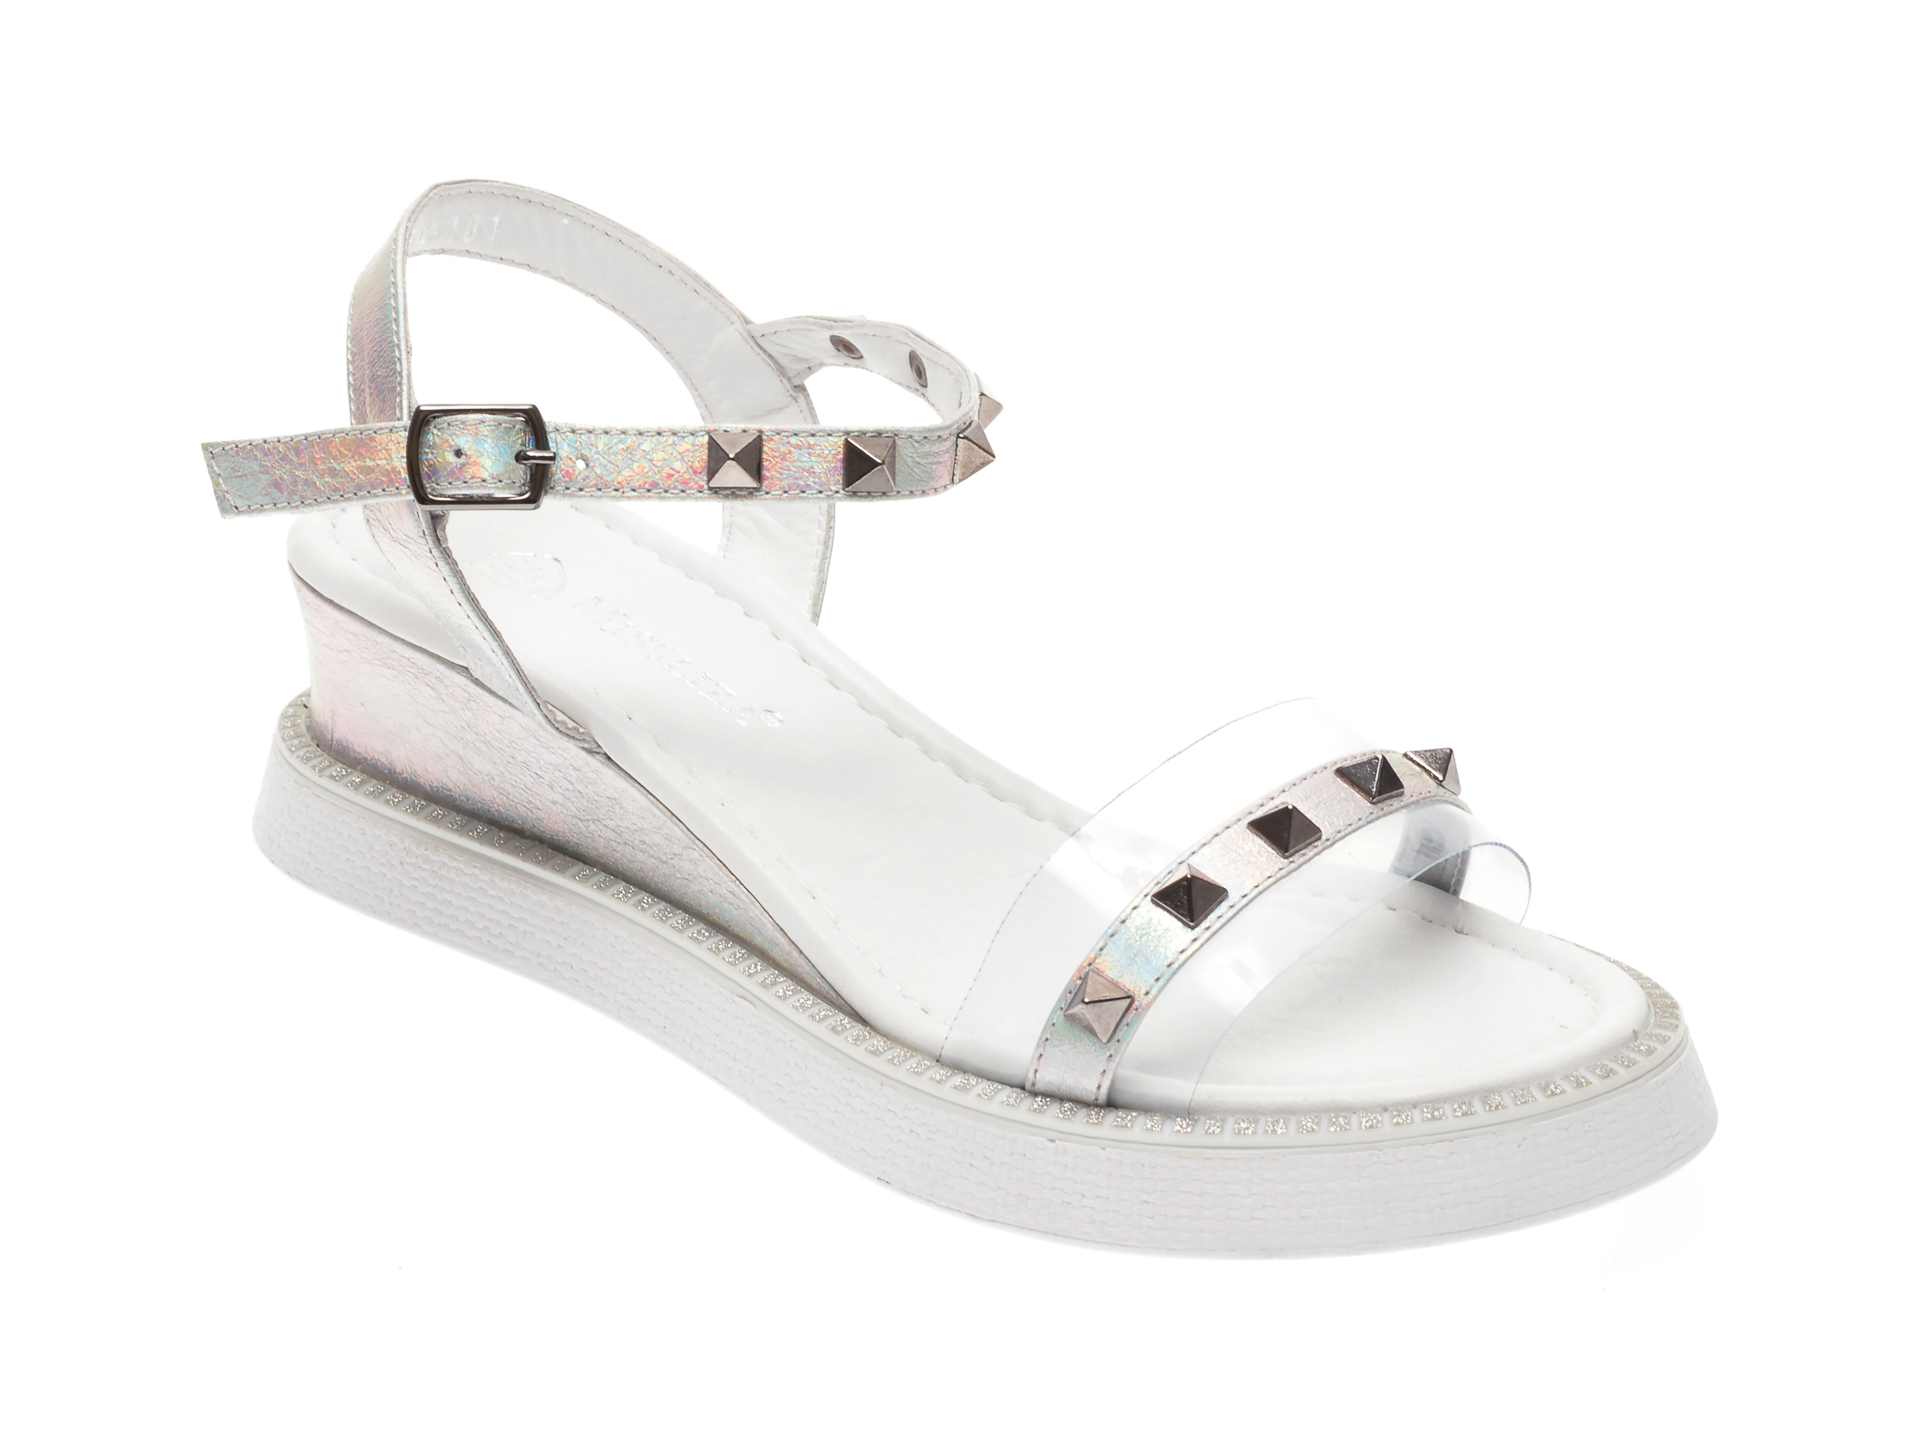 Sandale MISS LIZA argintii, 2620, din piele naturala lacuita